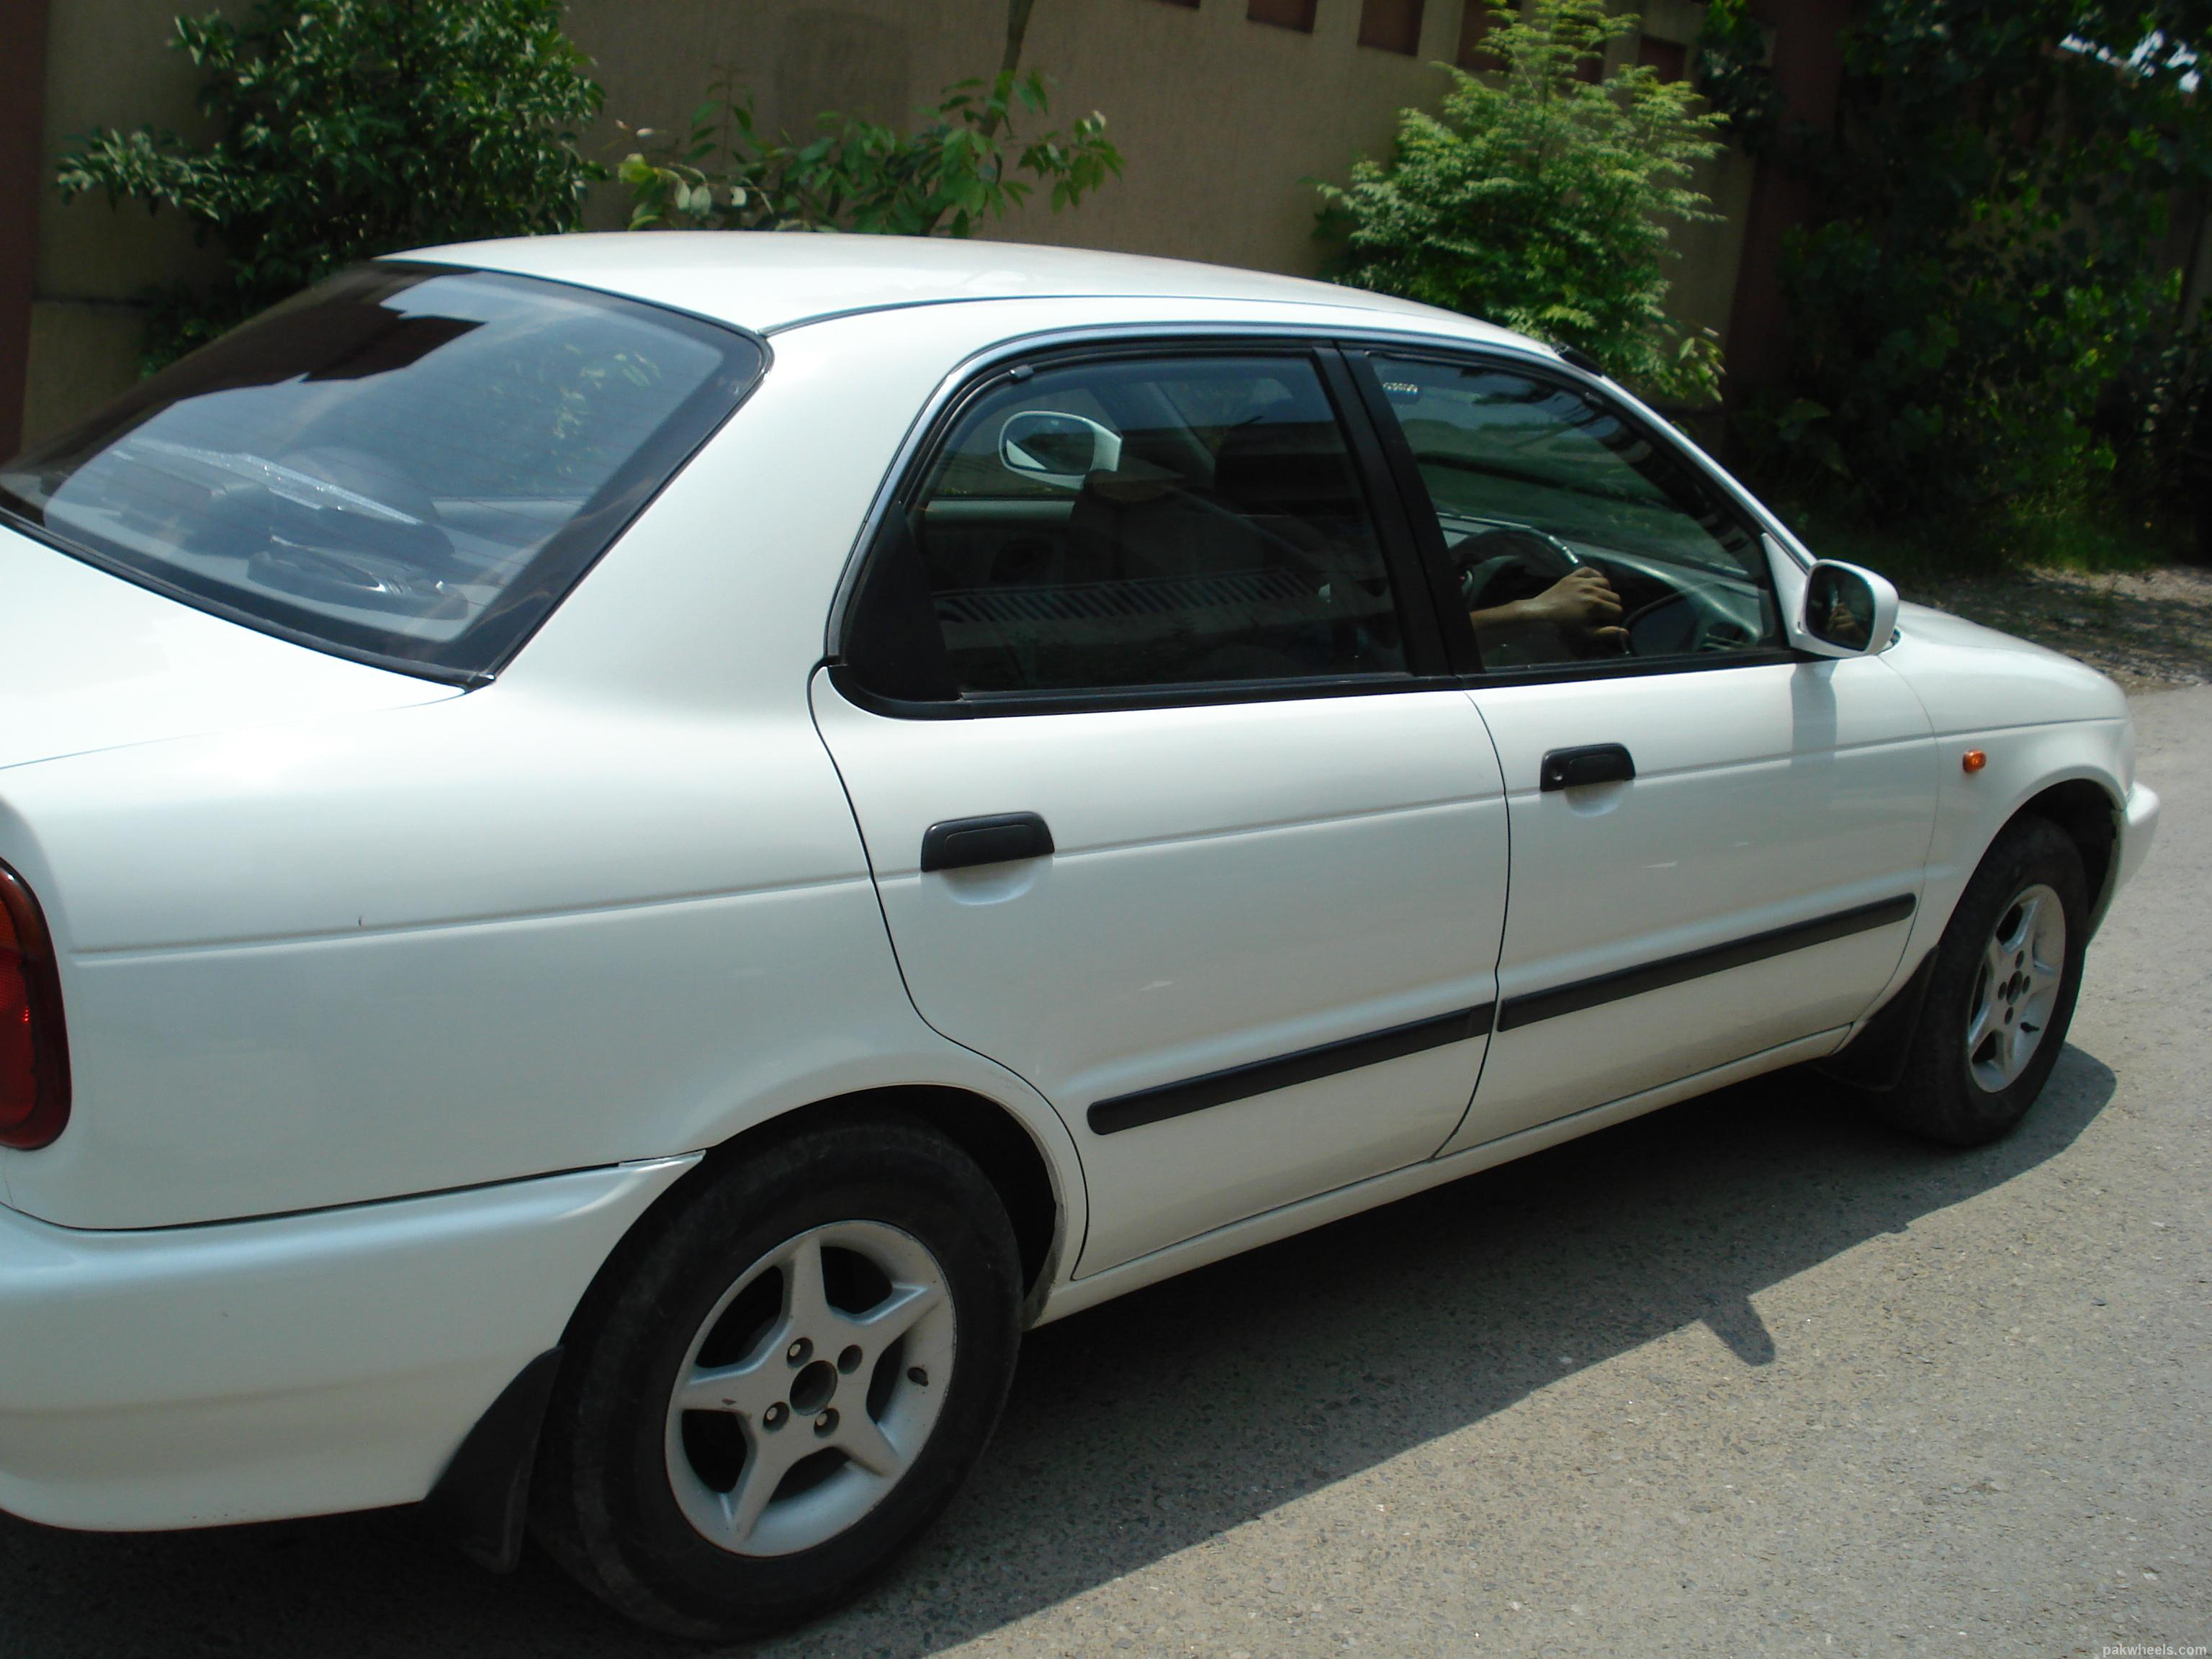 Suzuki Baleno 1999 Of 751 Member Ride 10399 Pakwheels